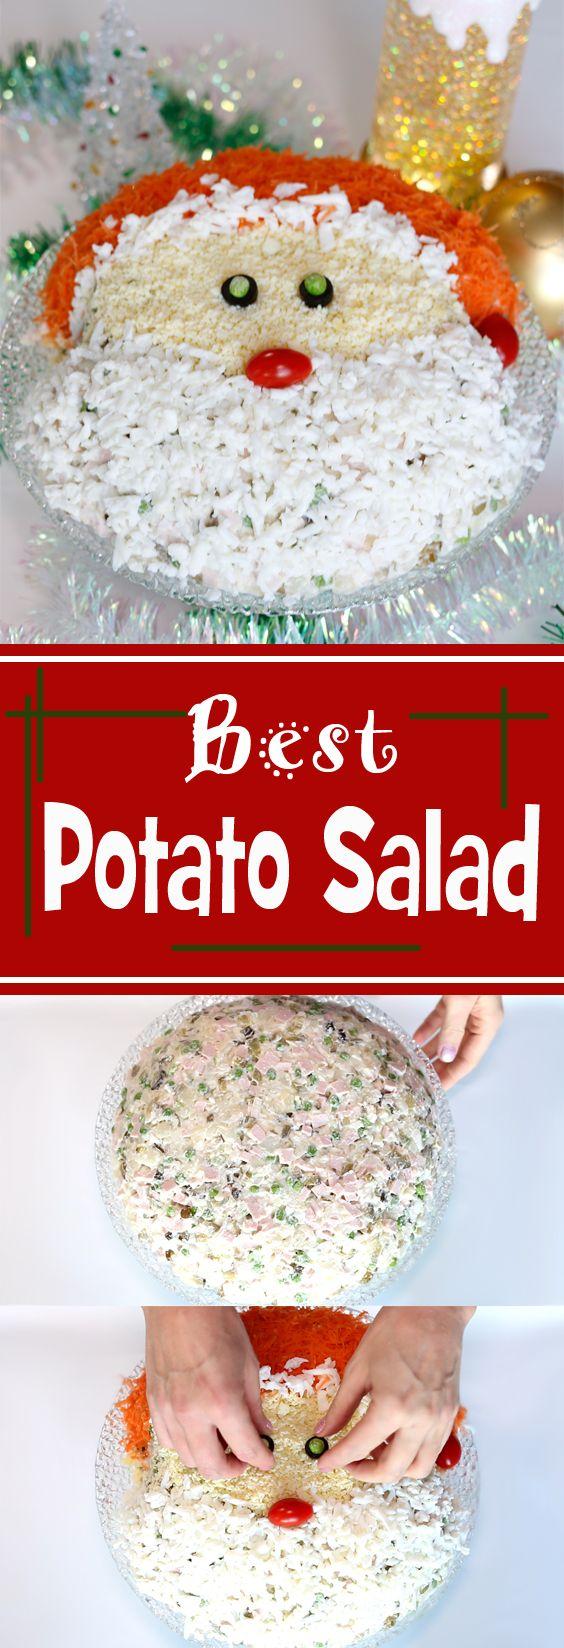 Best Potato Salad Recipe For Christmas